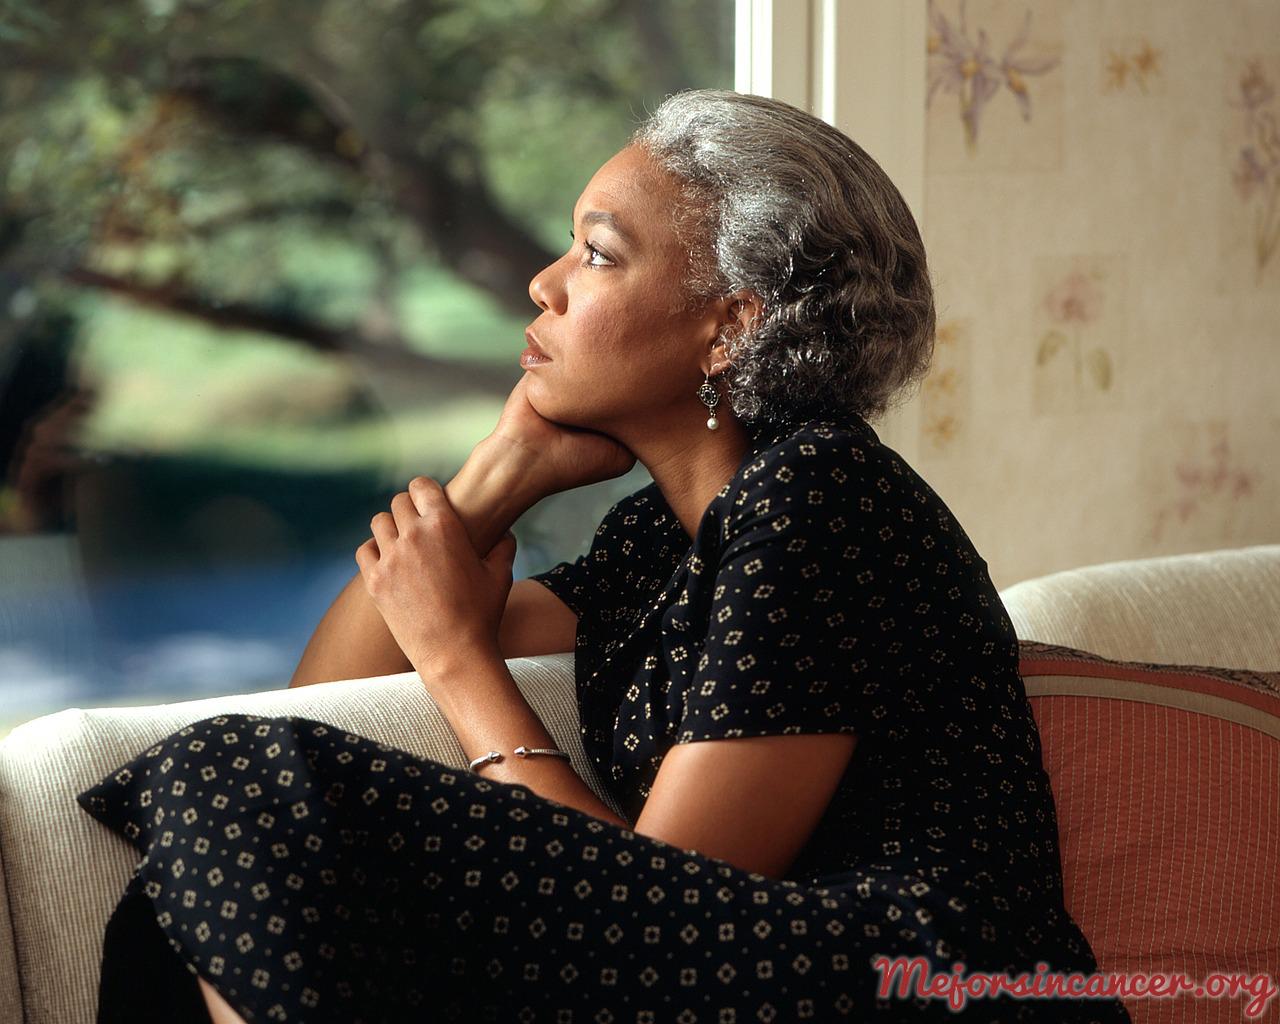 cancer_endometrio_matriz_mujer_menopausia_sangrado